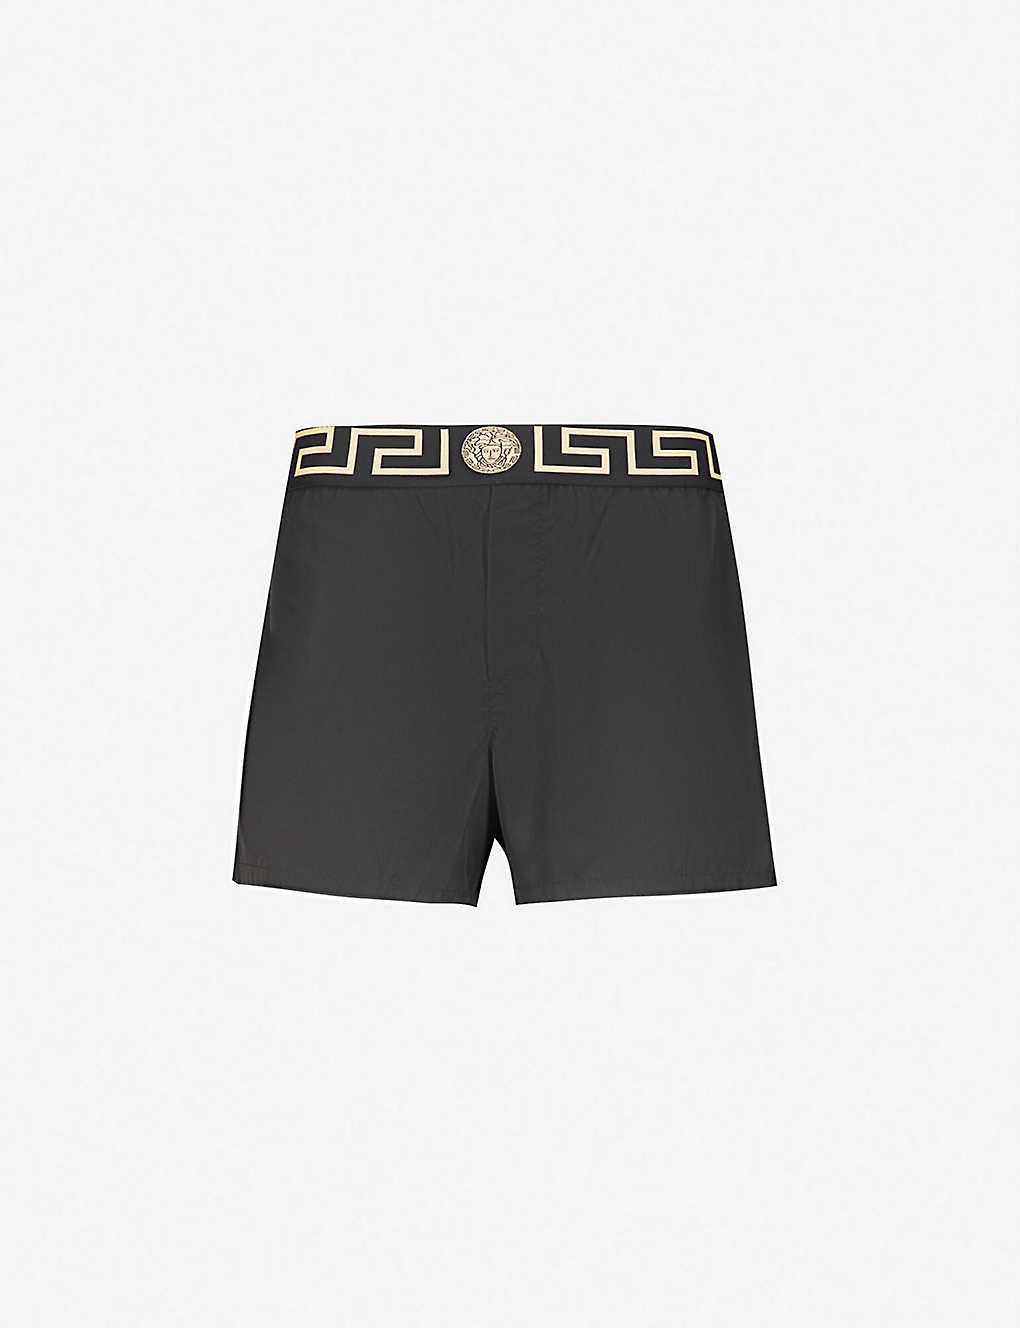 0304d342721c0 VERSACE - Iconic swim shorts | Selfridges.com